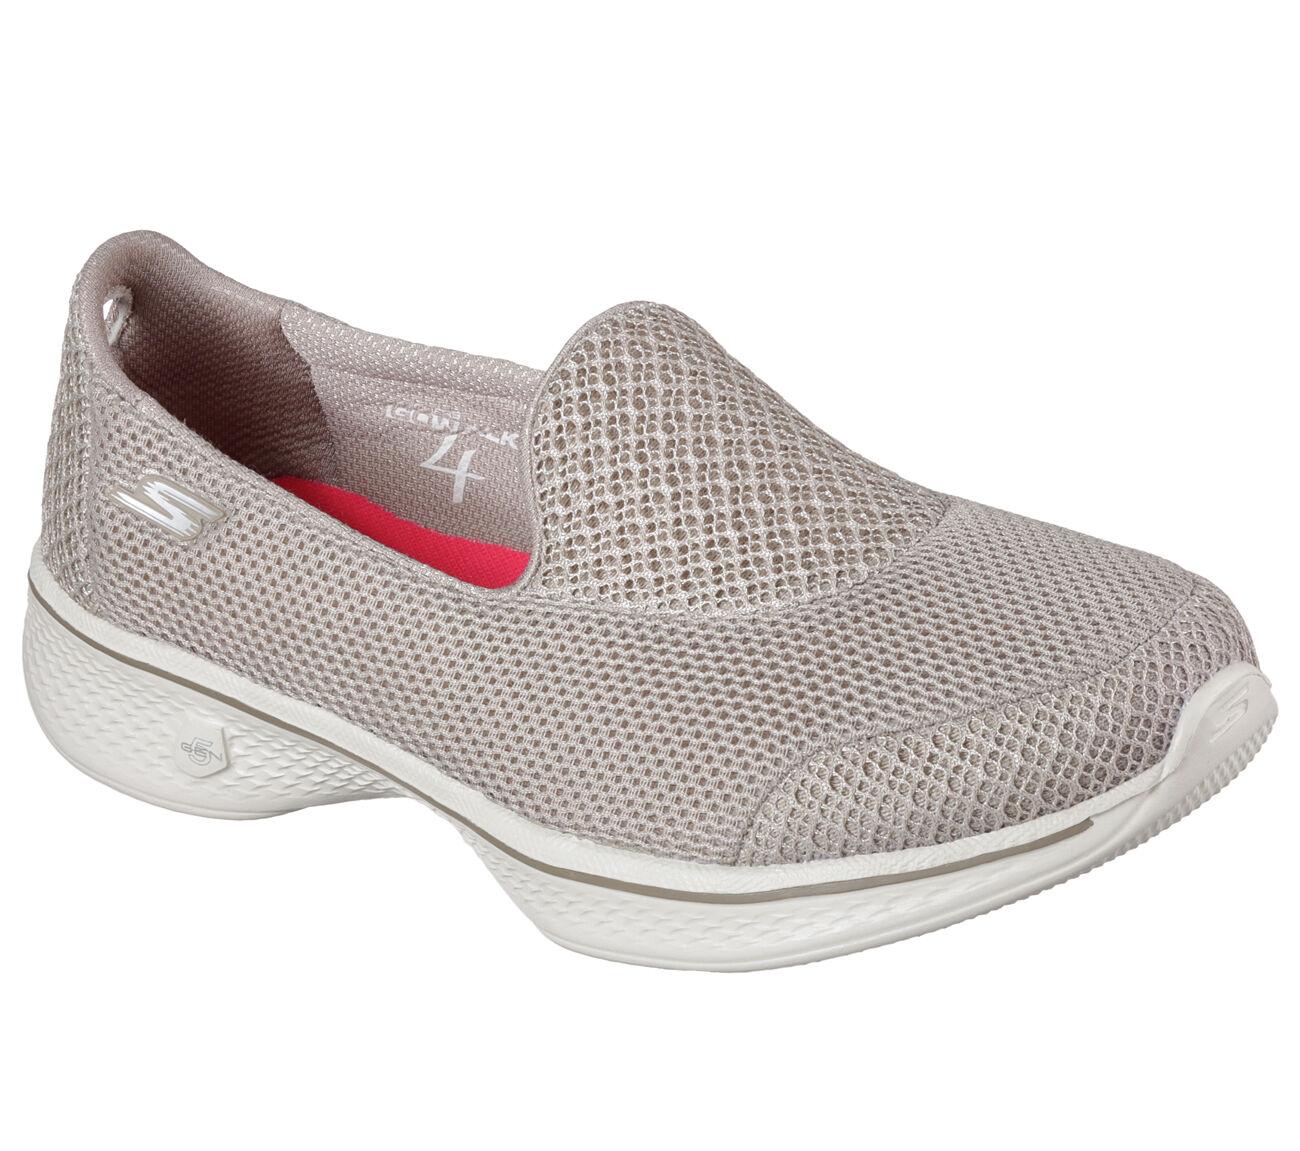 SKECHERS GOWALK scarpe 4 PRO 14170 TPE scarpe GOWALK donna sportive mocassino slip on tessuto 93c8ab